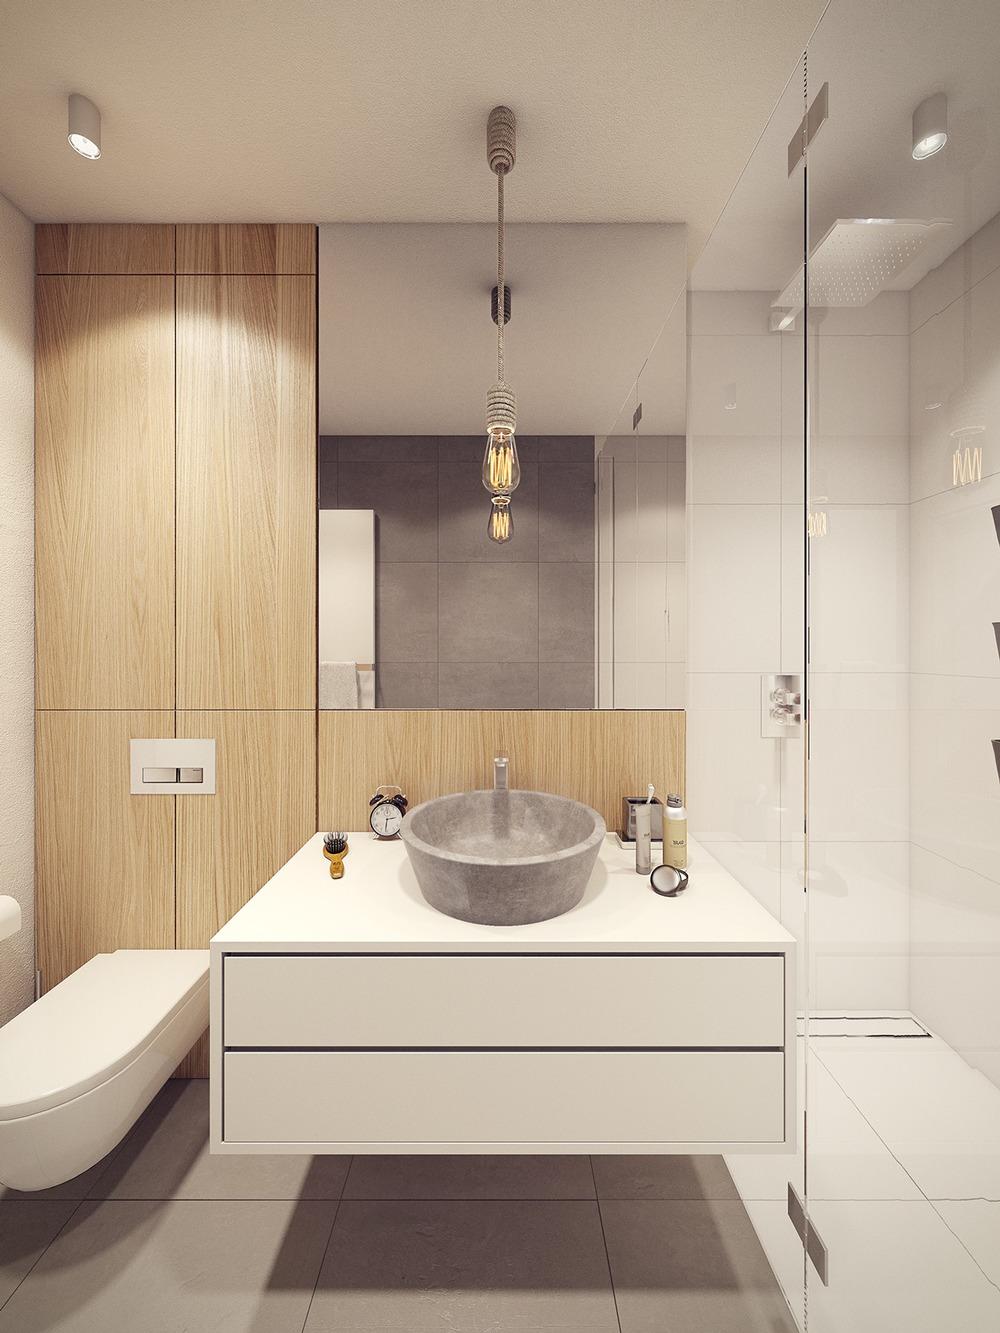 edison-bulb-design.jpg